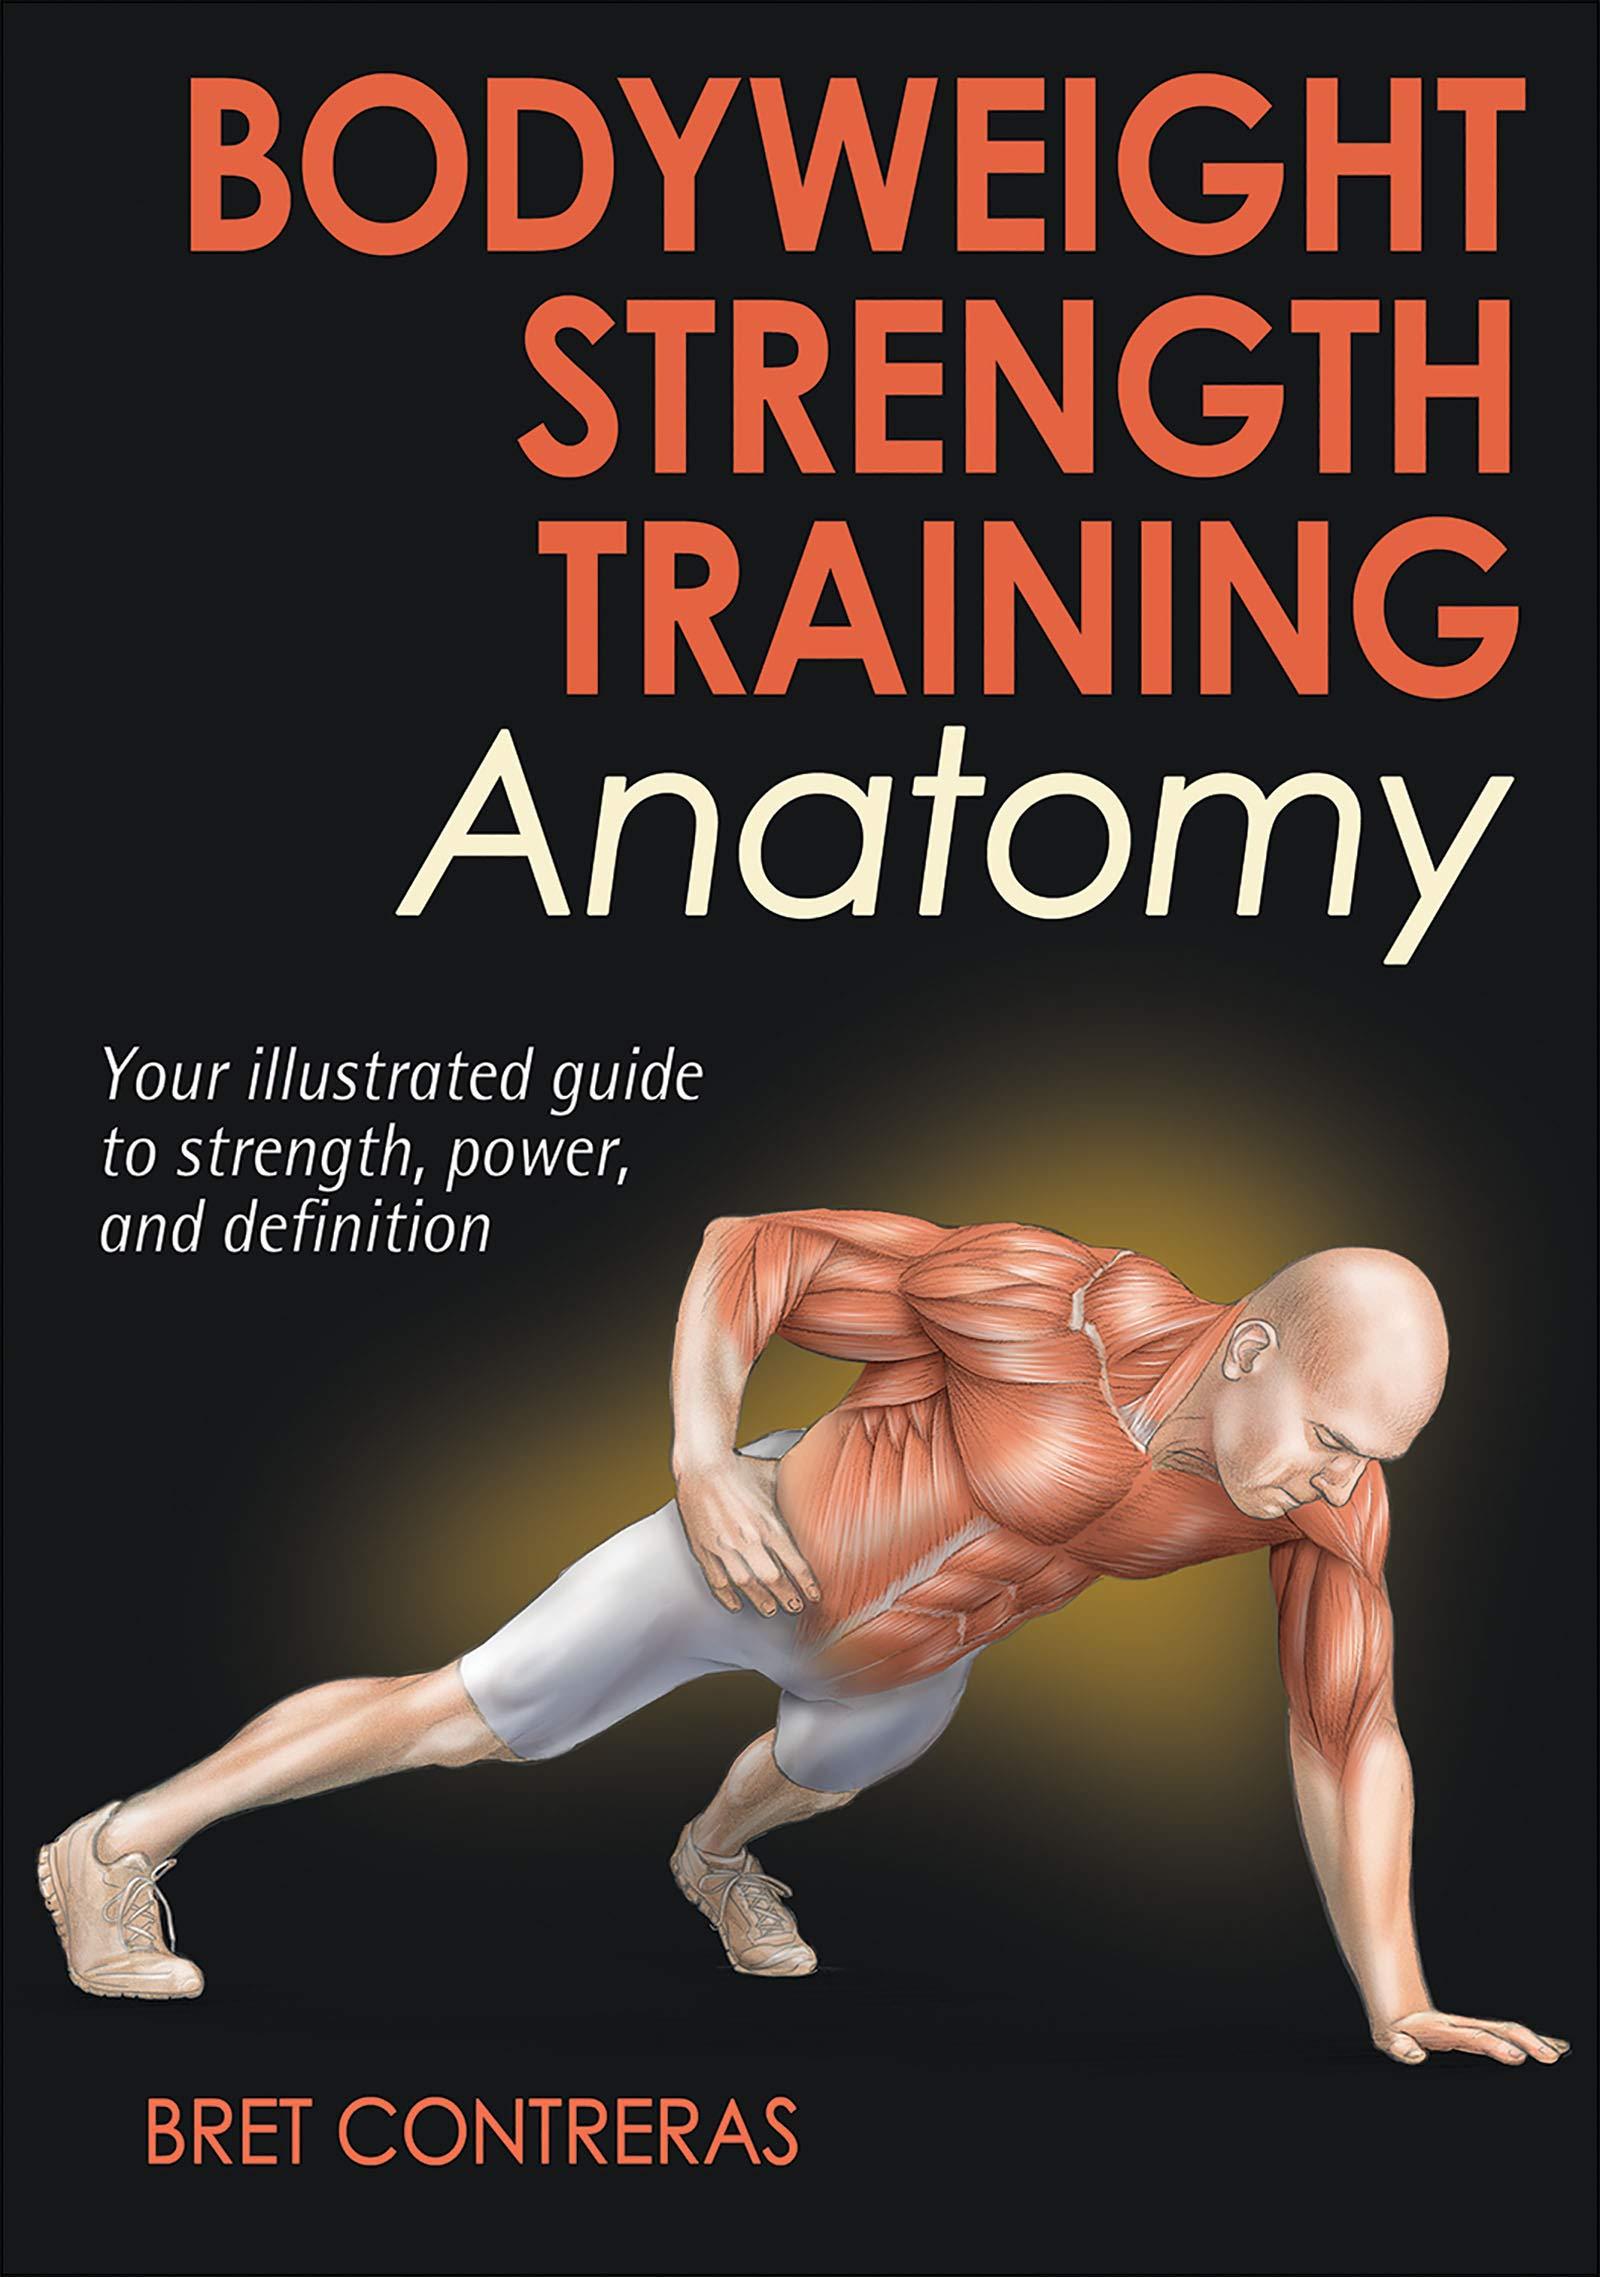 Bodyweight Strength Training Anatomy Bret Contreras 8601400742761